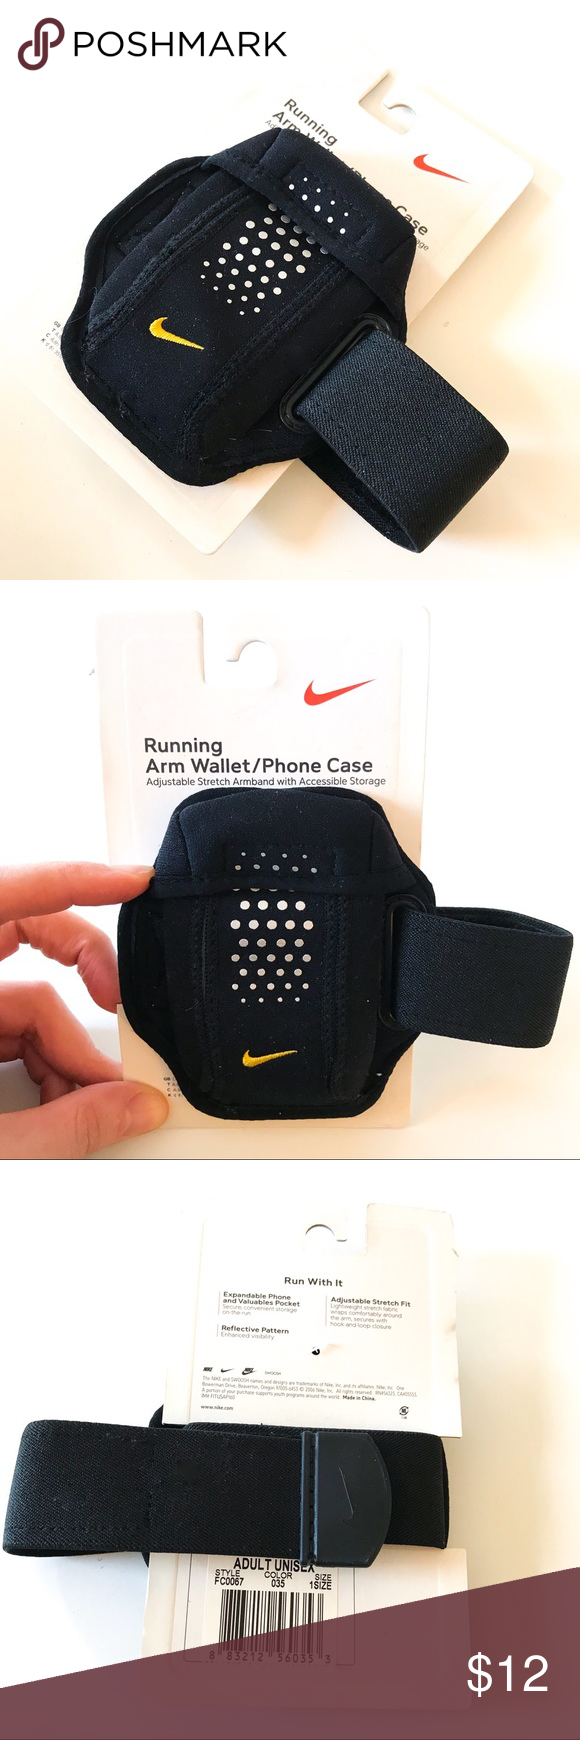 Nike armband running accessory holder nwt armband running and